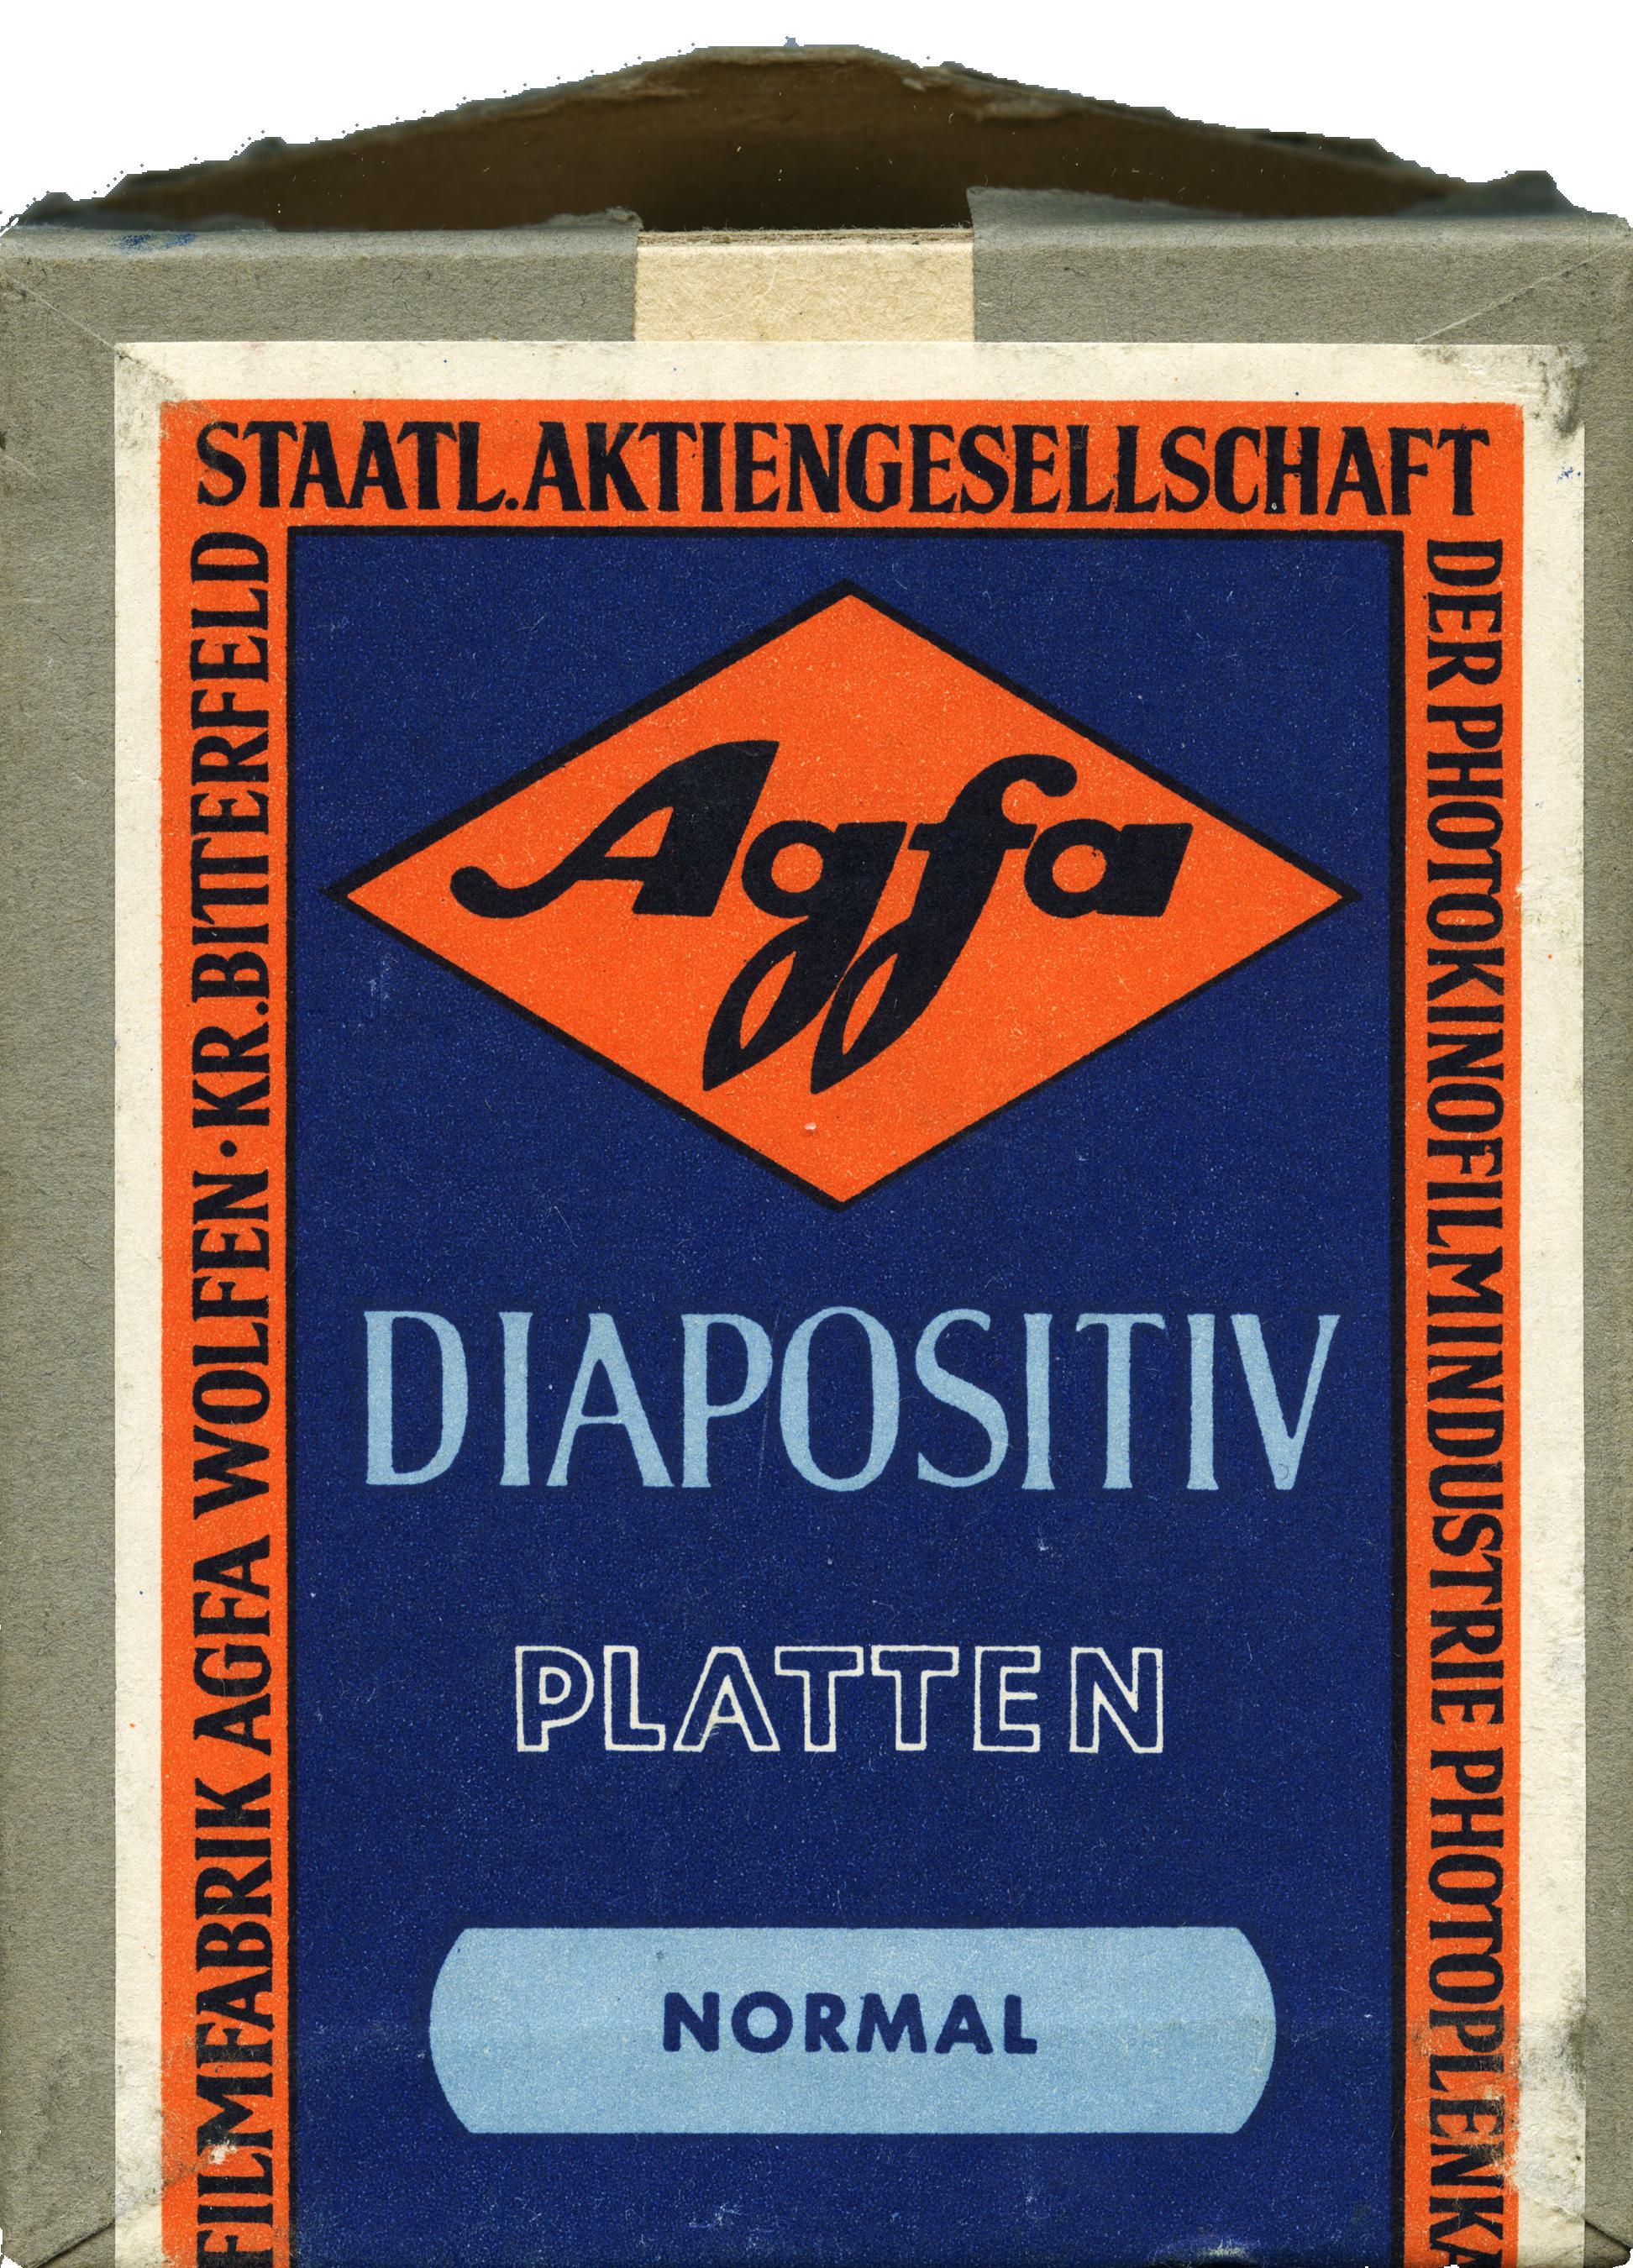 Joker01 - Agfa-Platten DDR.png